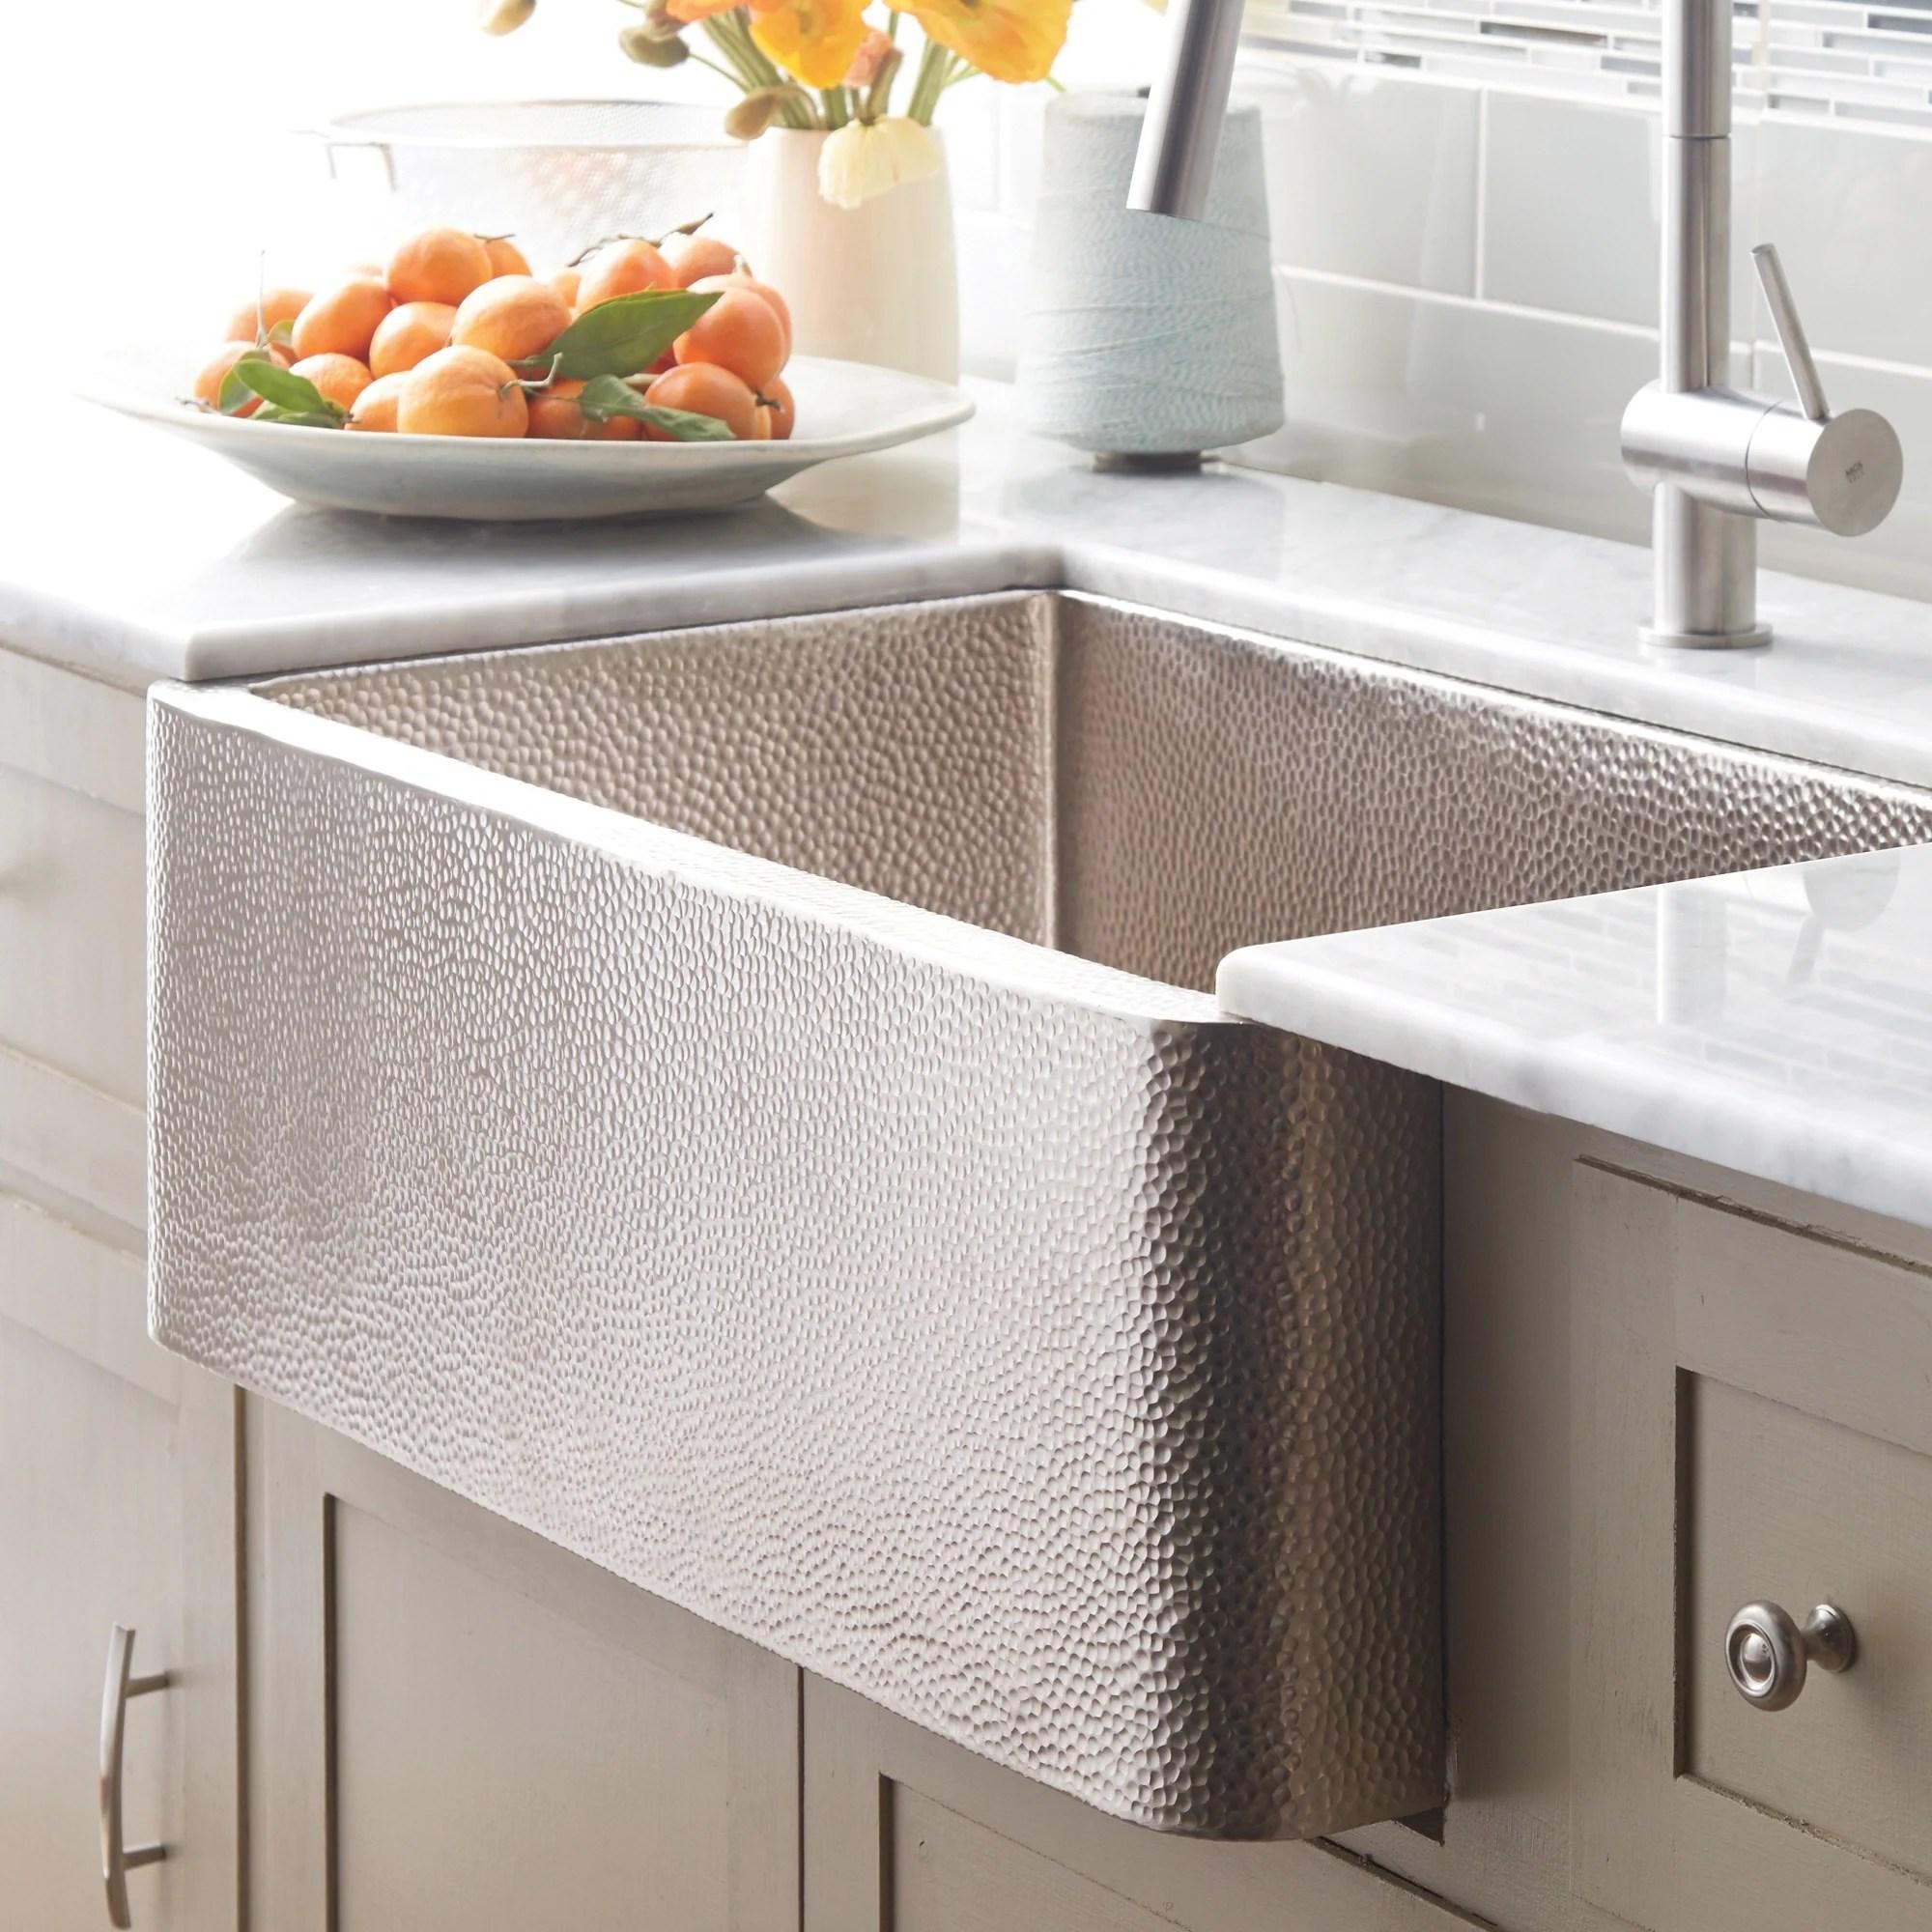 farmhouse brushed nickel 33 inch kitchen sink 33 x 22 x 10 5